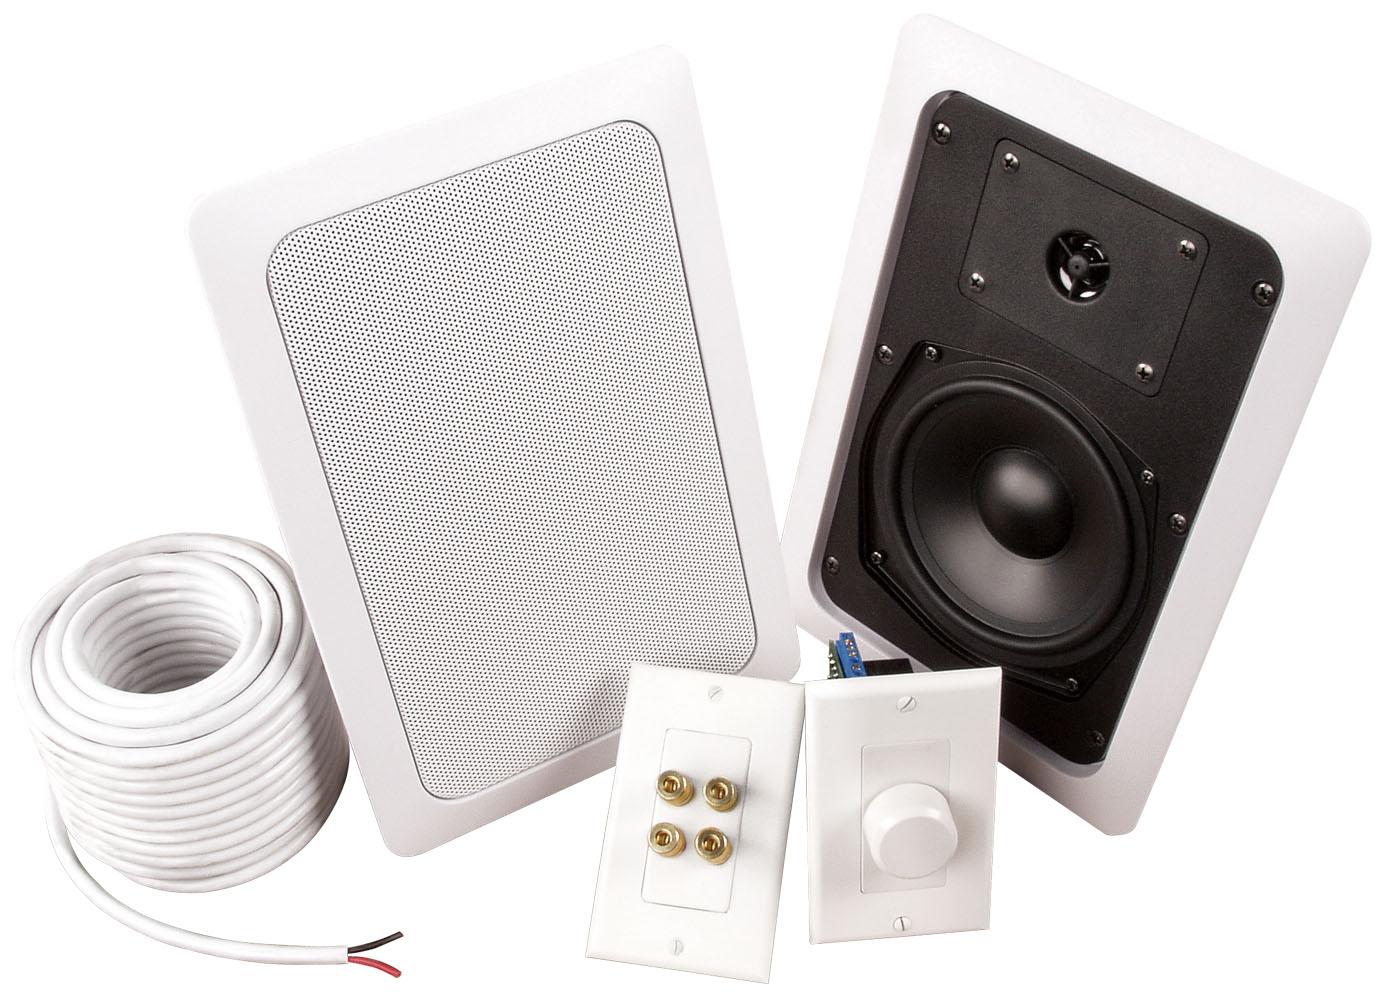 MUSICA ADZ502W 5 25 inch 2-Way In-Wall Add A Zone Speaker Kit